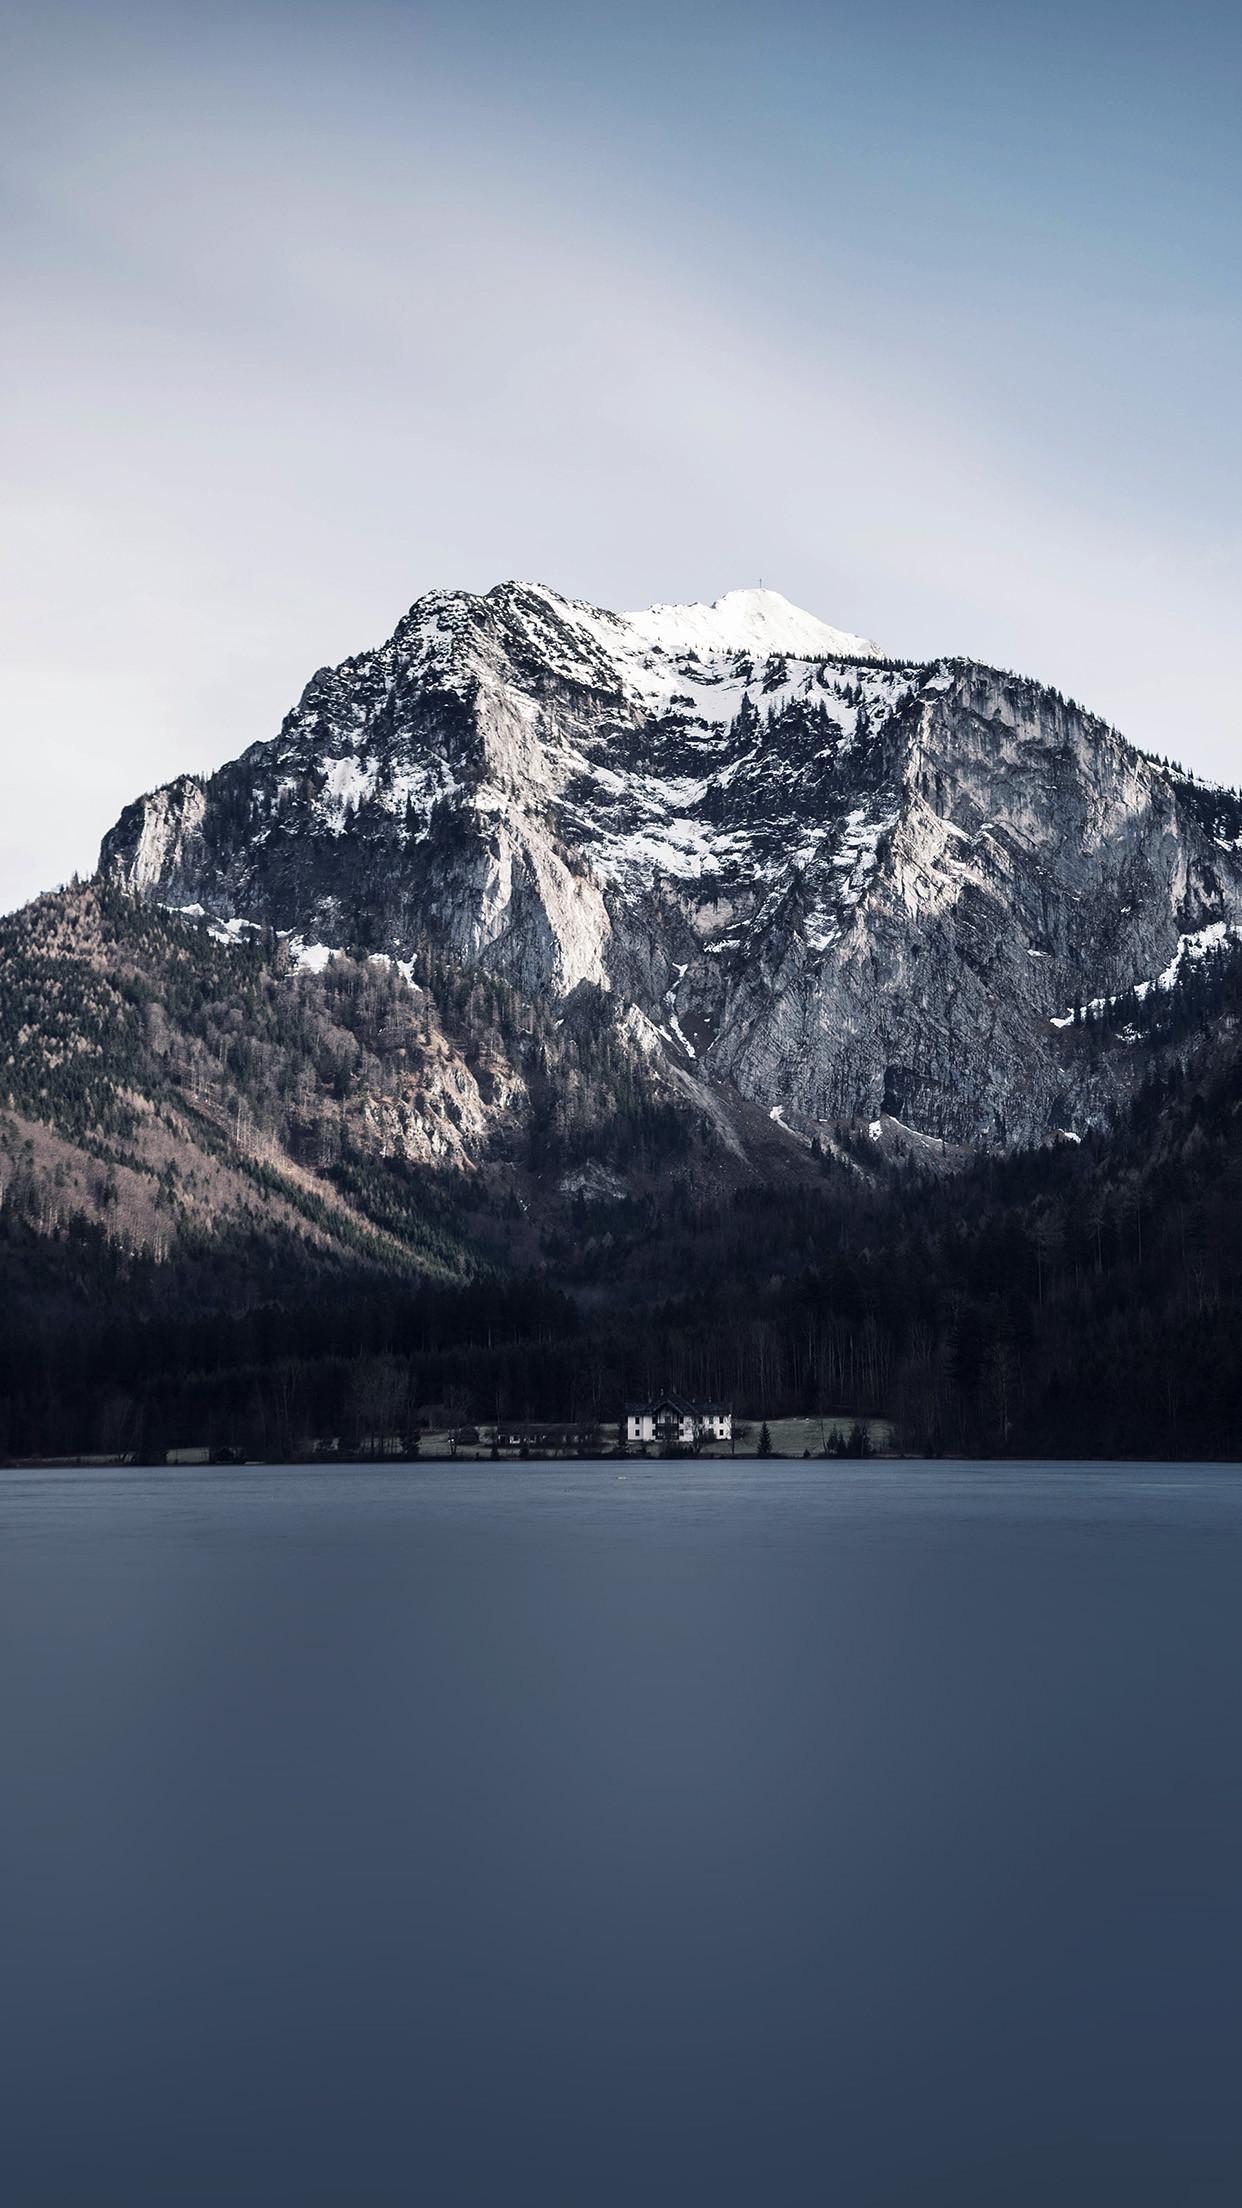 Winter Mountain Lake View Snow Android Wallpaper …